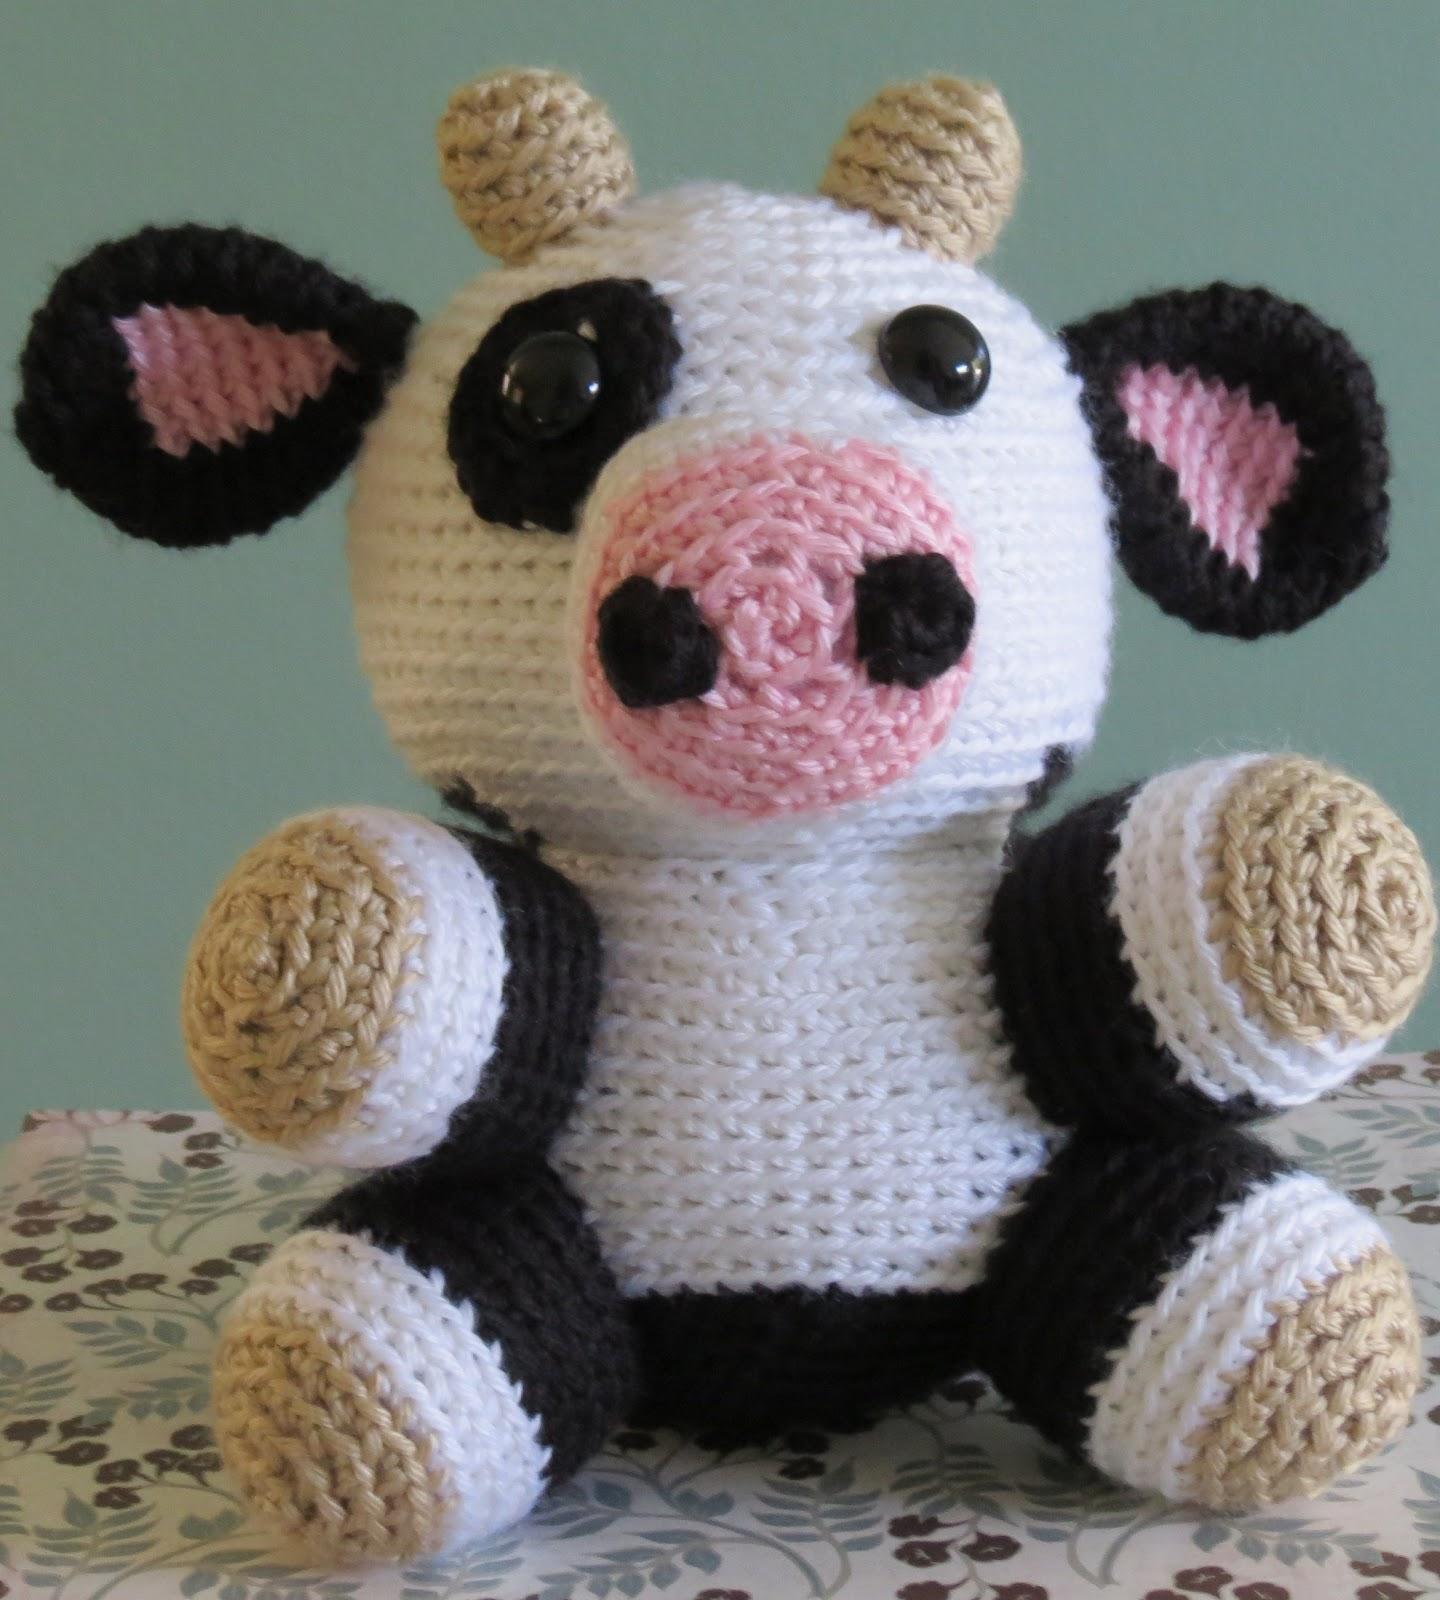 Amigurumi Animals : Adrialys Handmade Creations: FO Friday: Amigurumi Animals